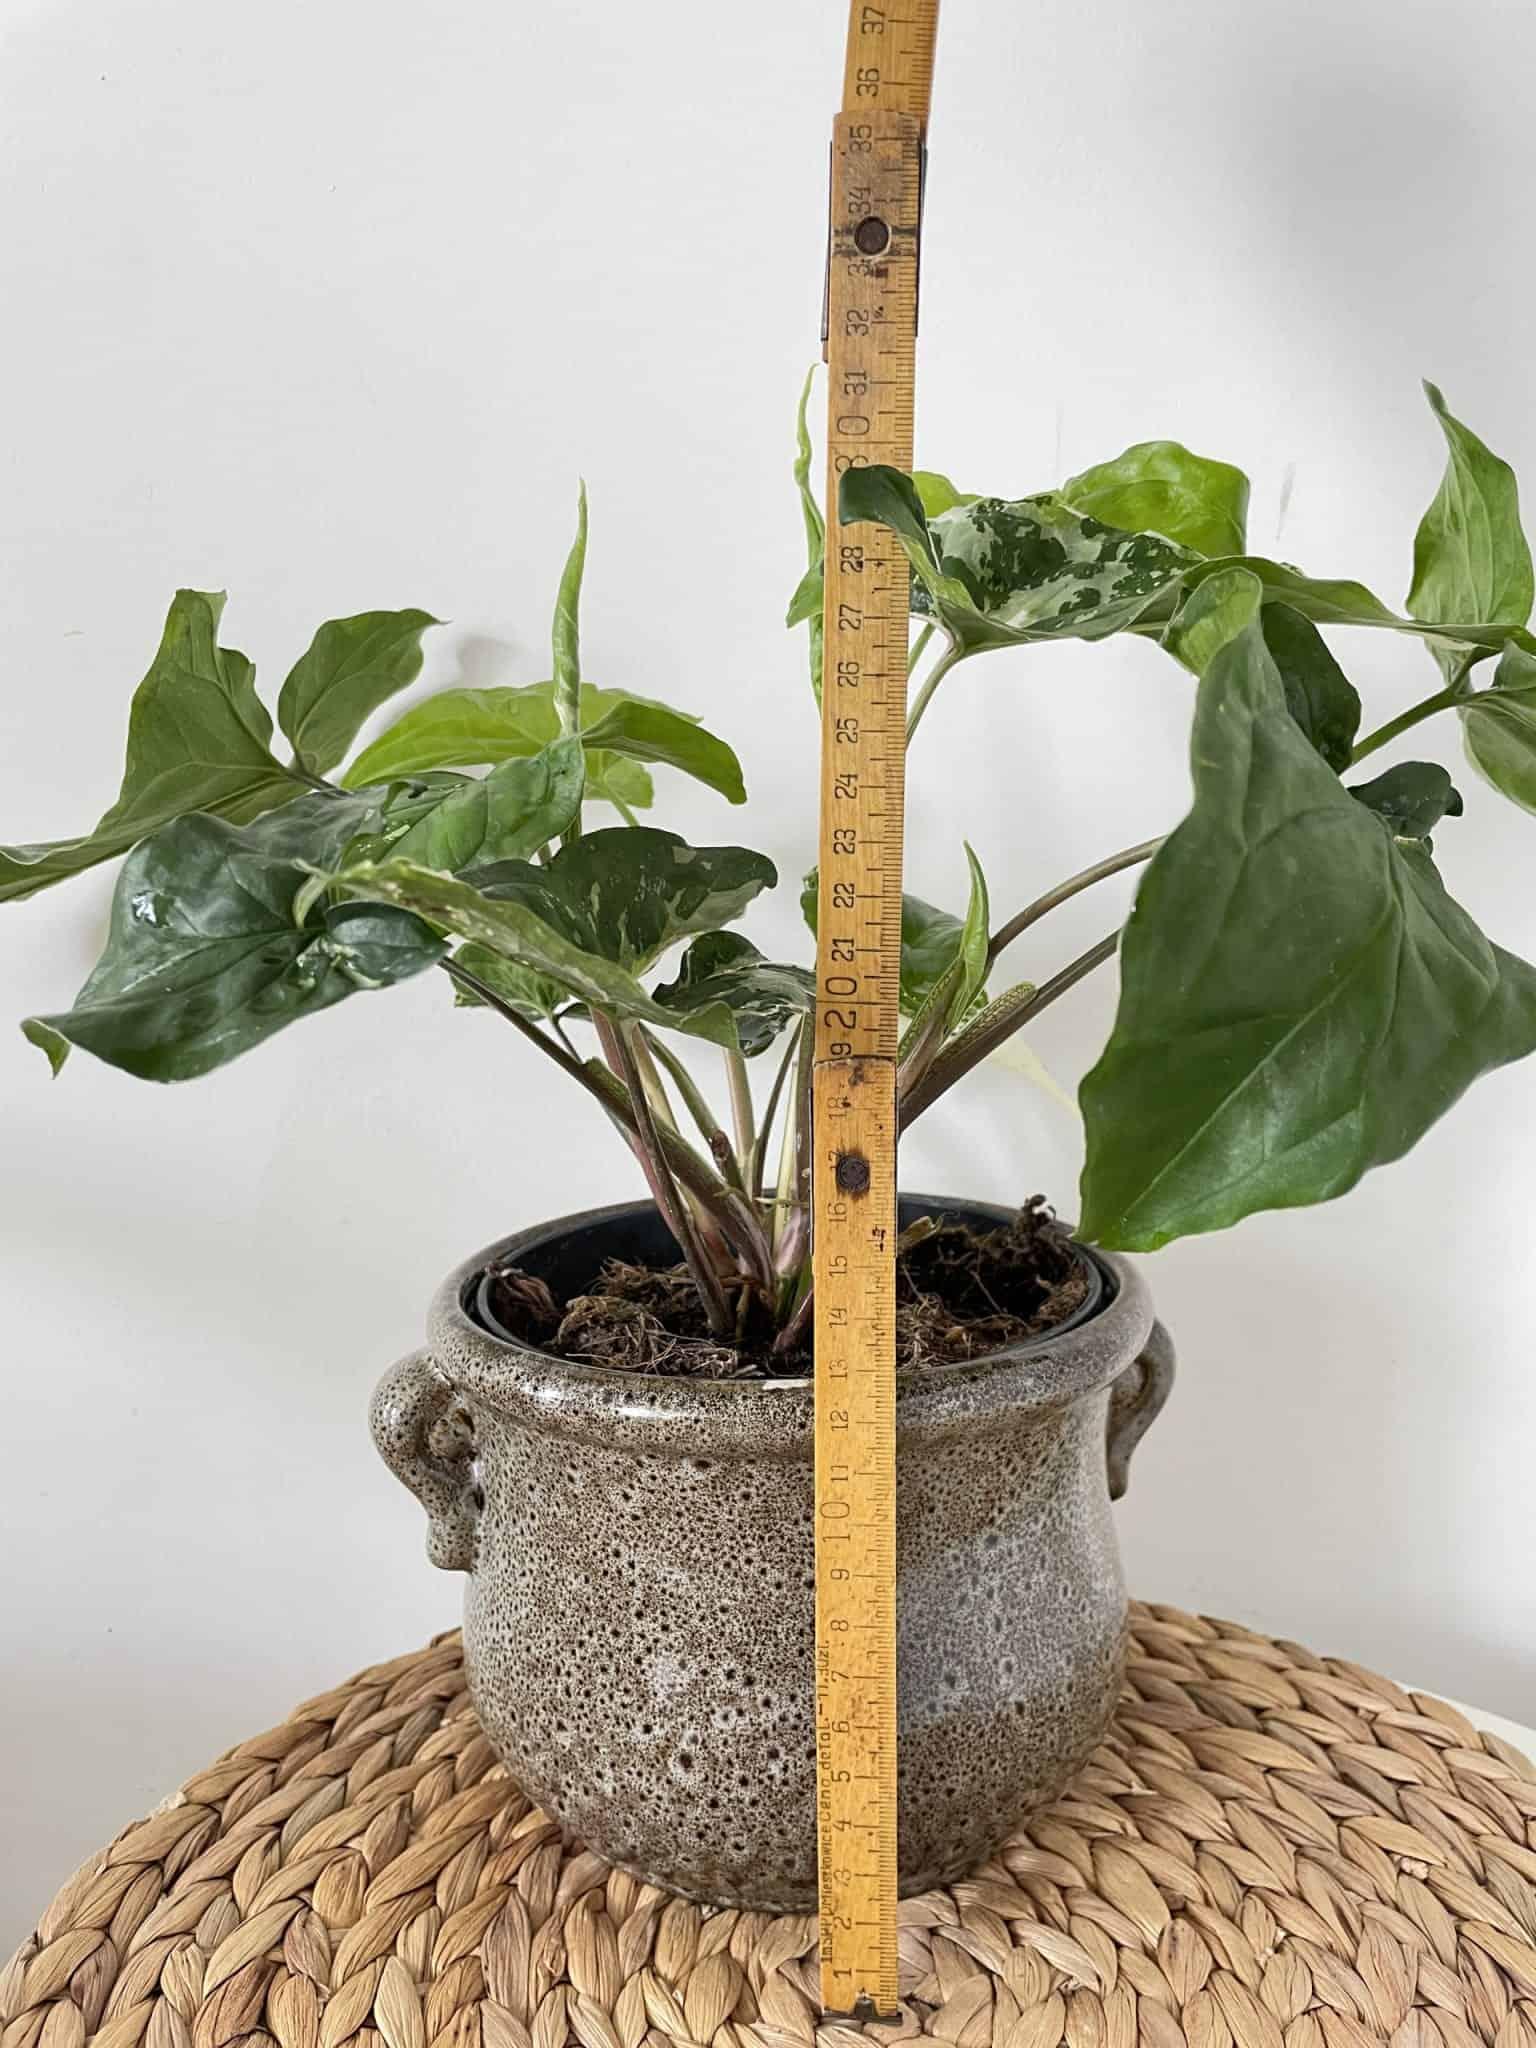 Syngonium Albo Variegata (Arrowhead Plant) in 15cm pot